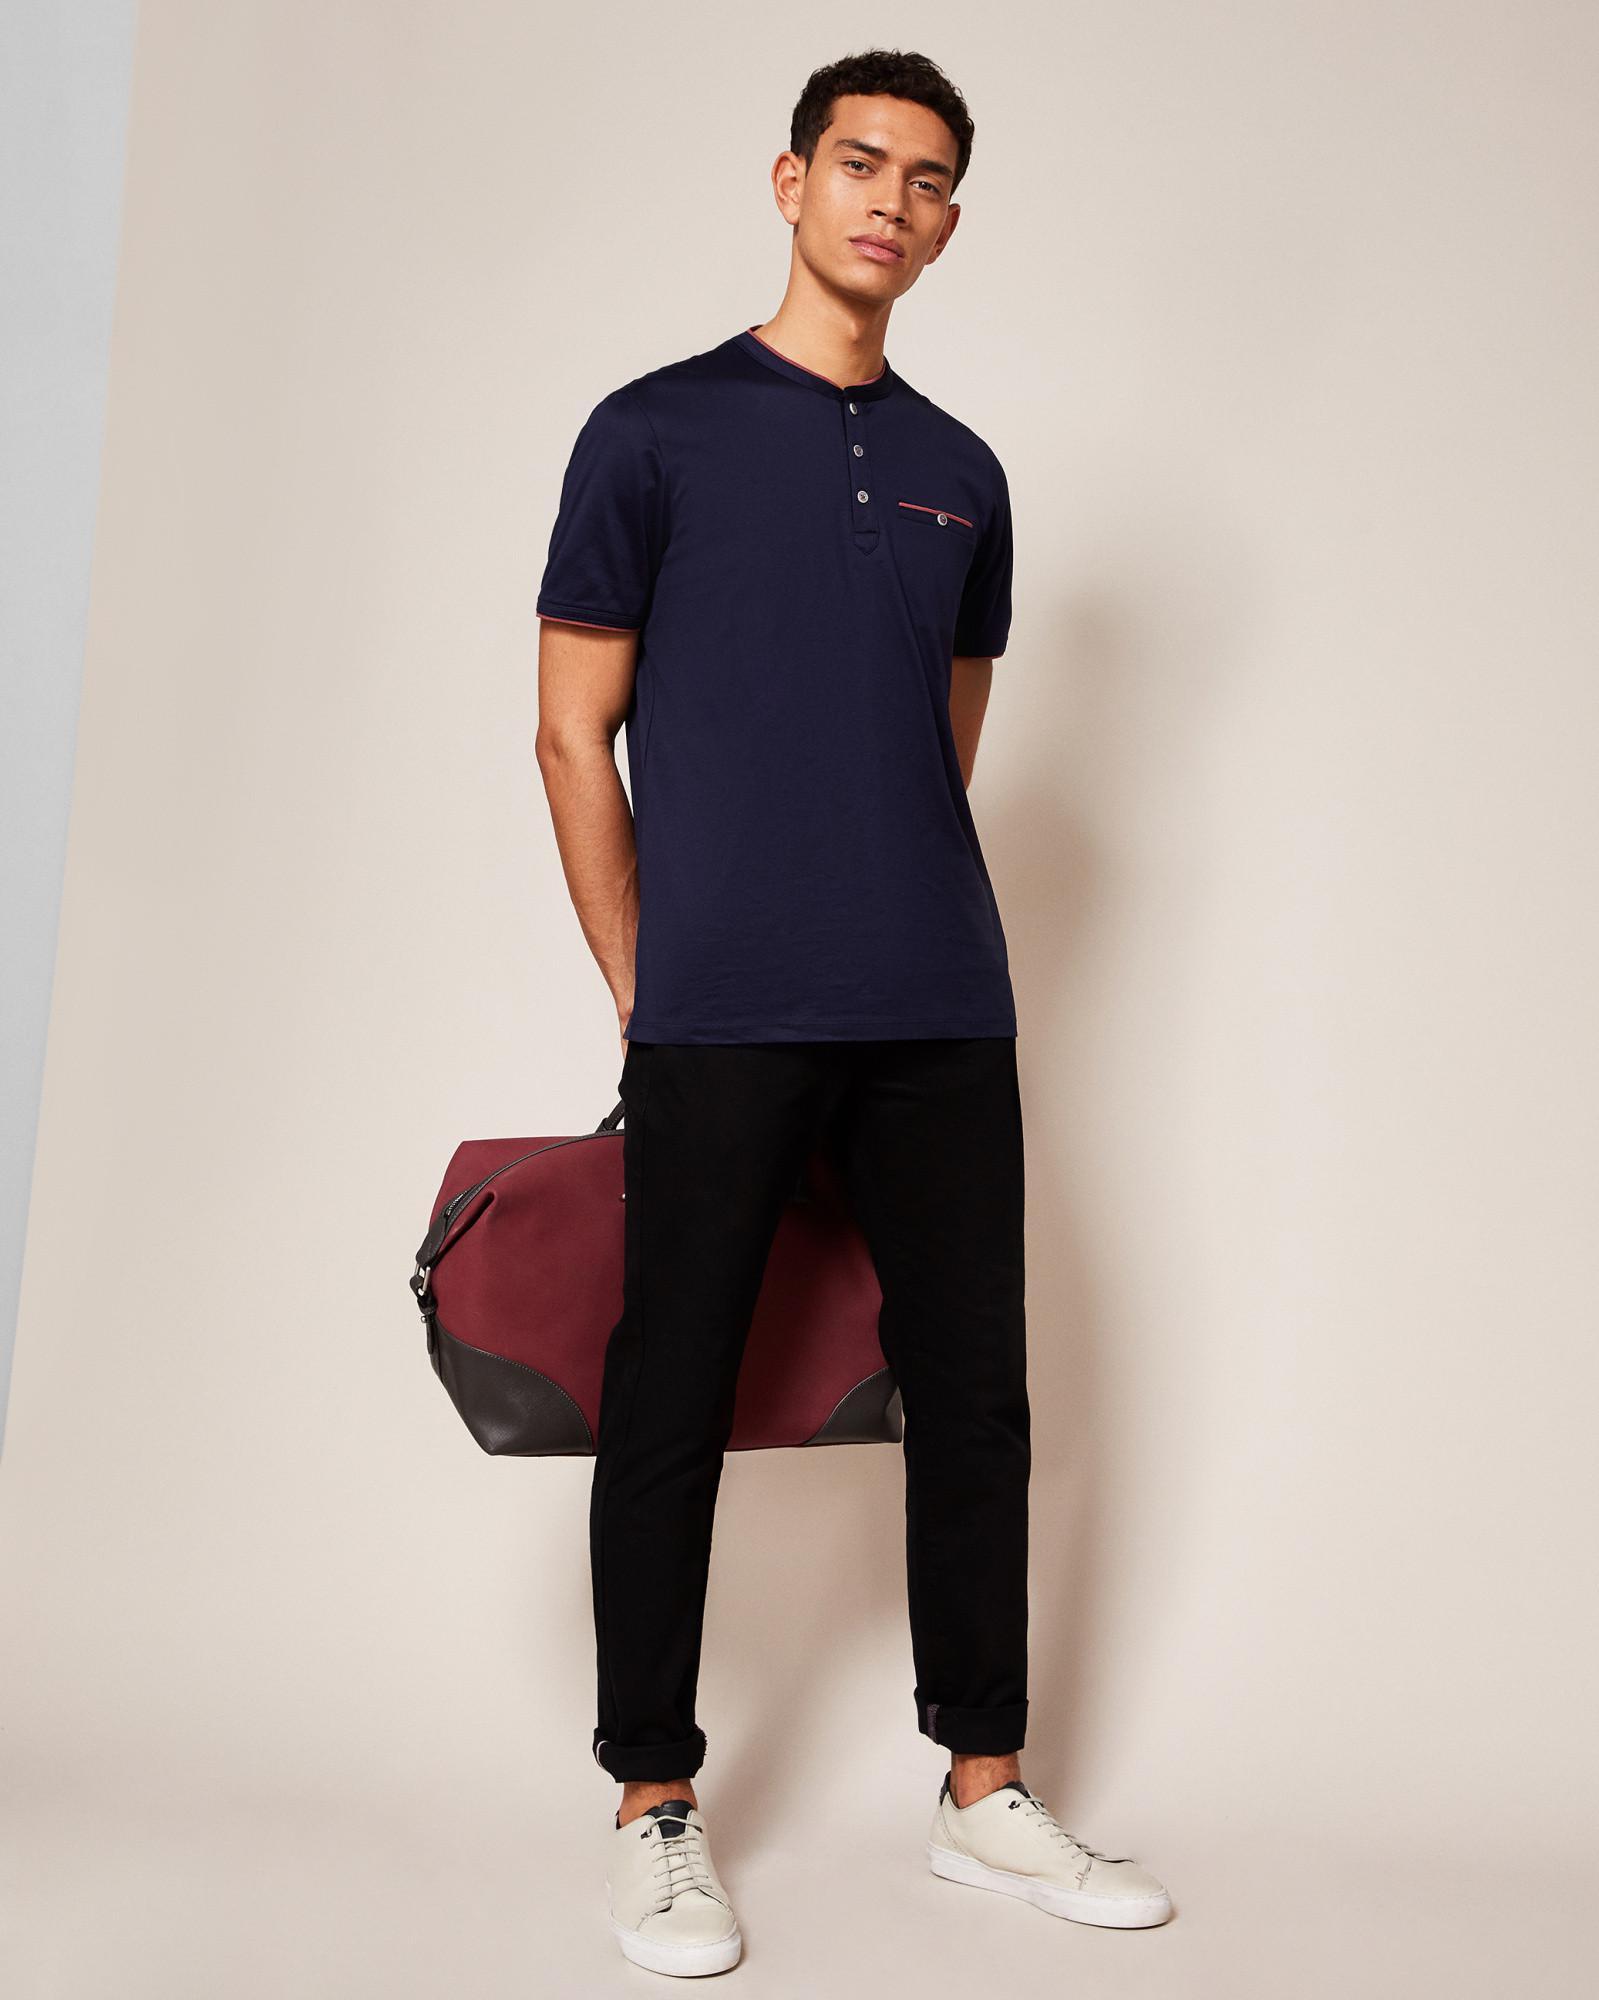 Ted Baker Henley Neck Cotton T-shirt in Navy (Blue) for Men